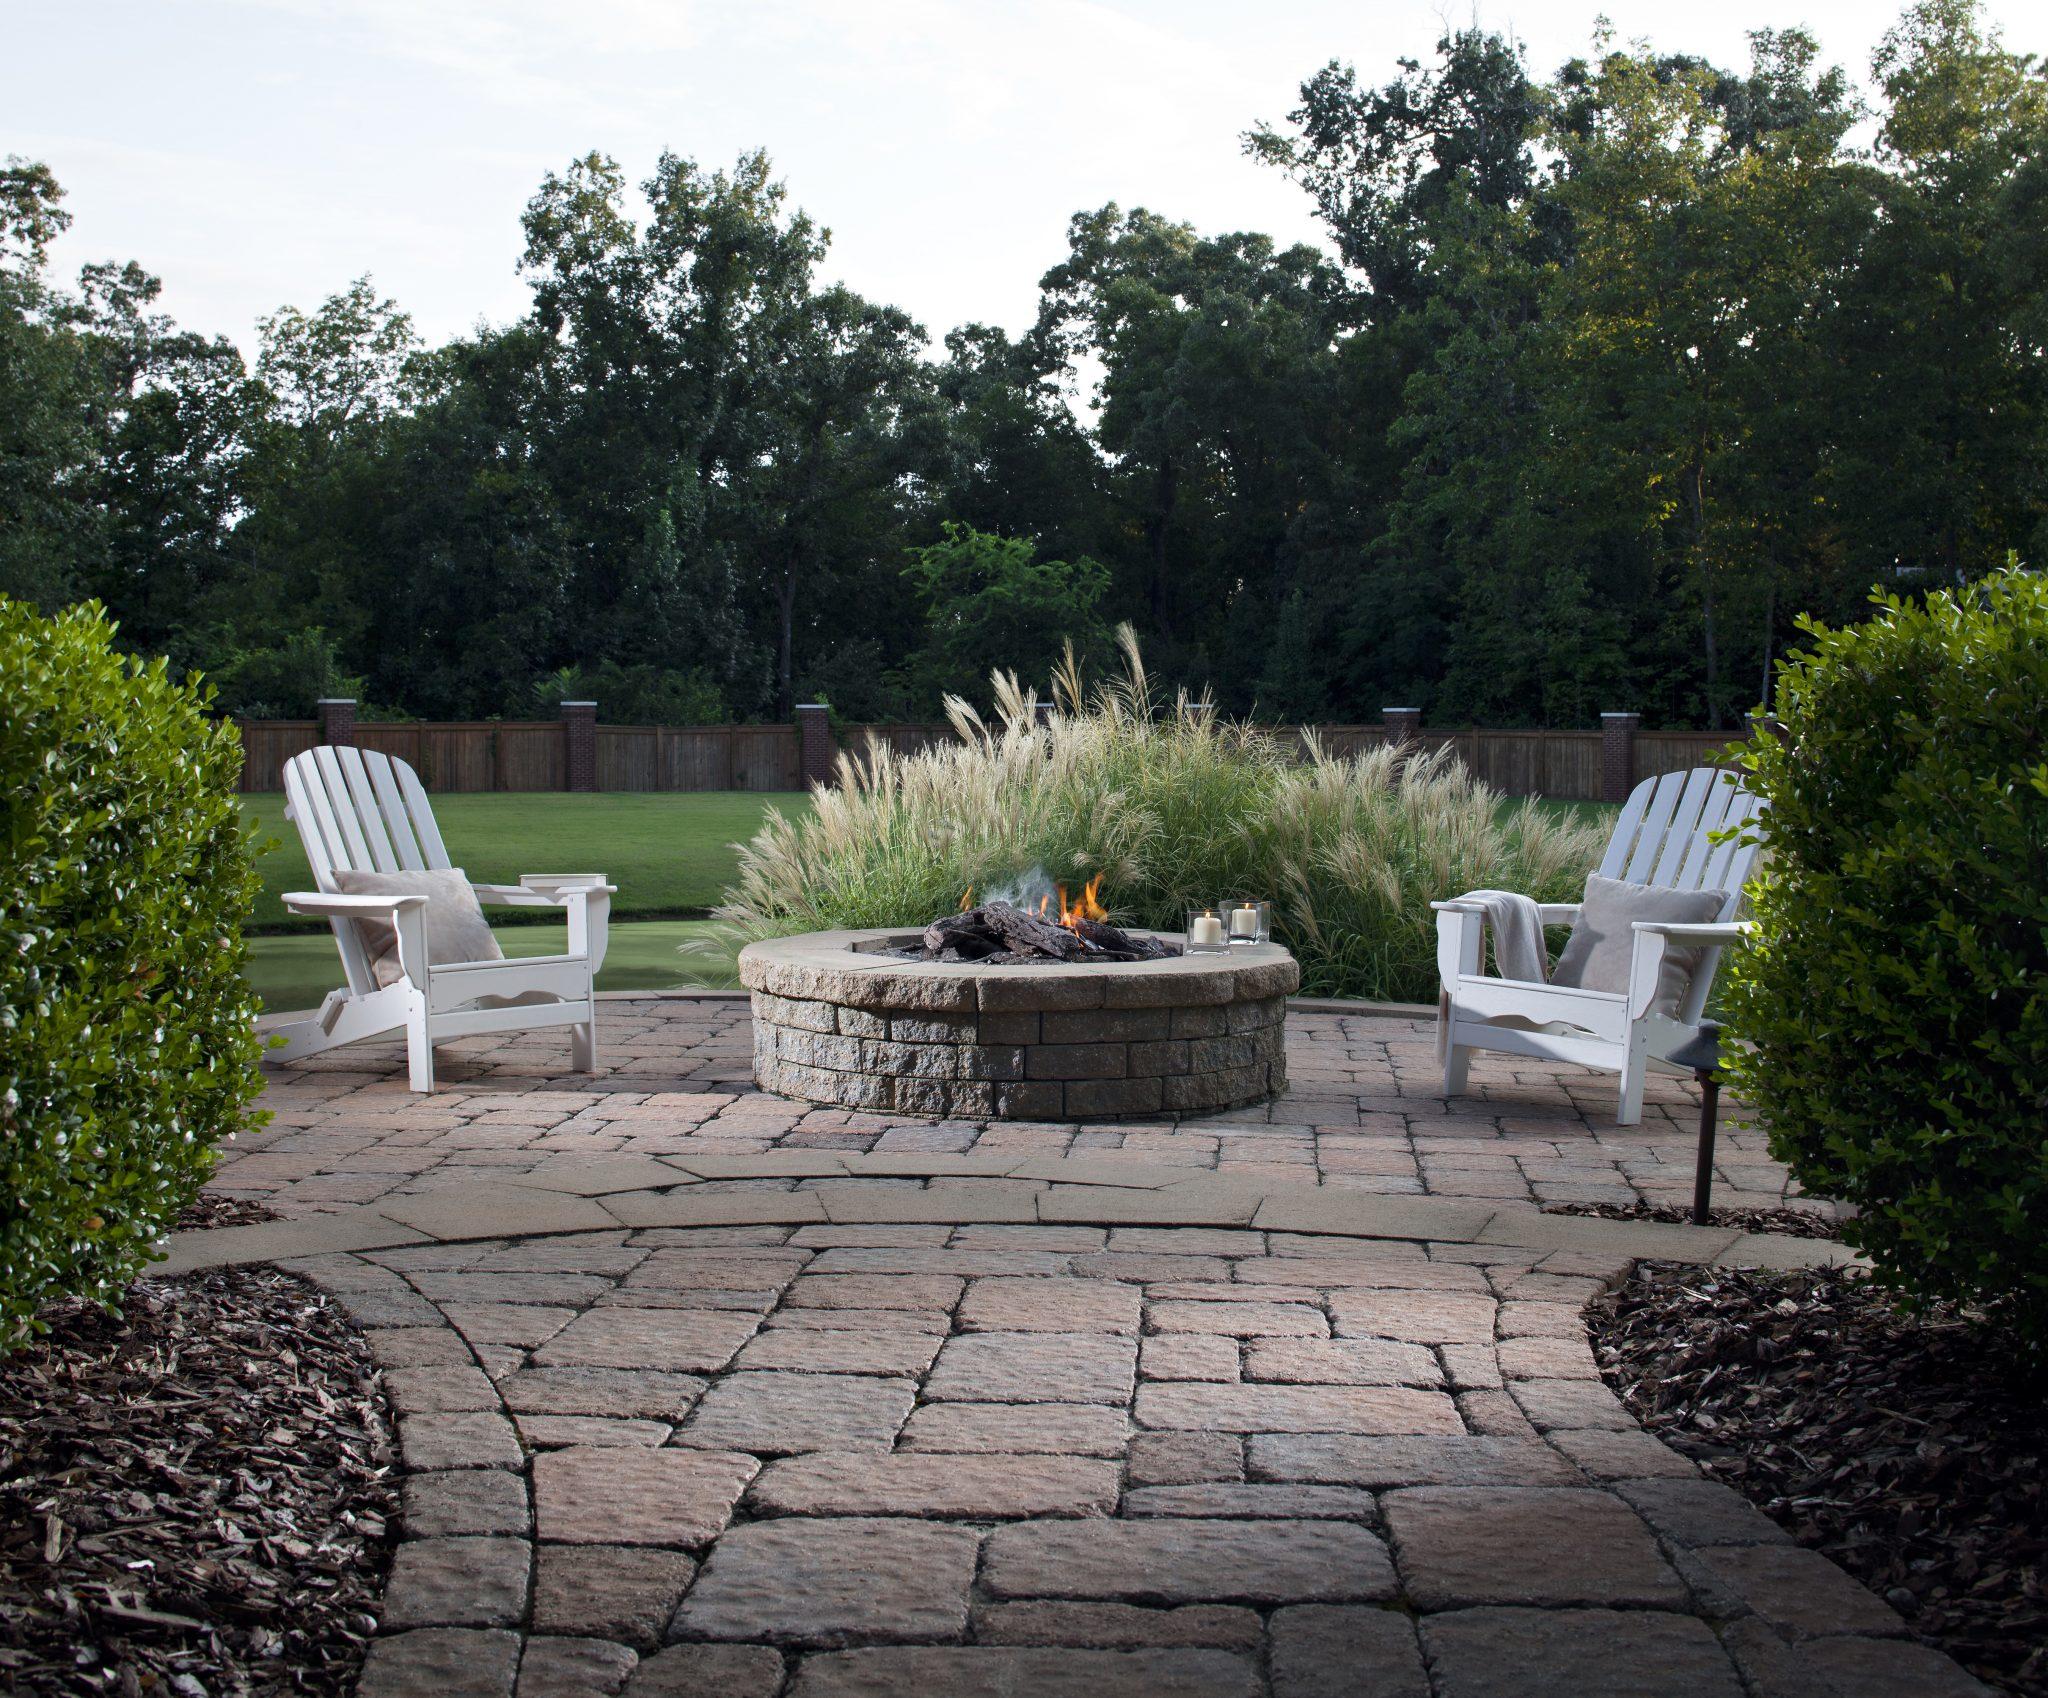 Spruce up your backyard ideas